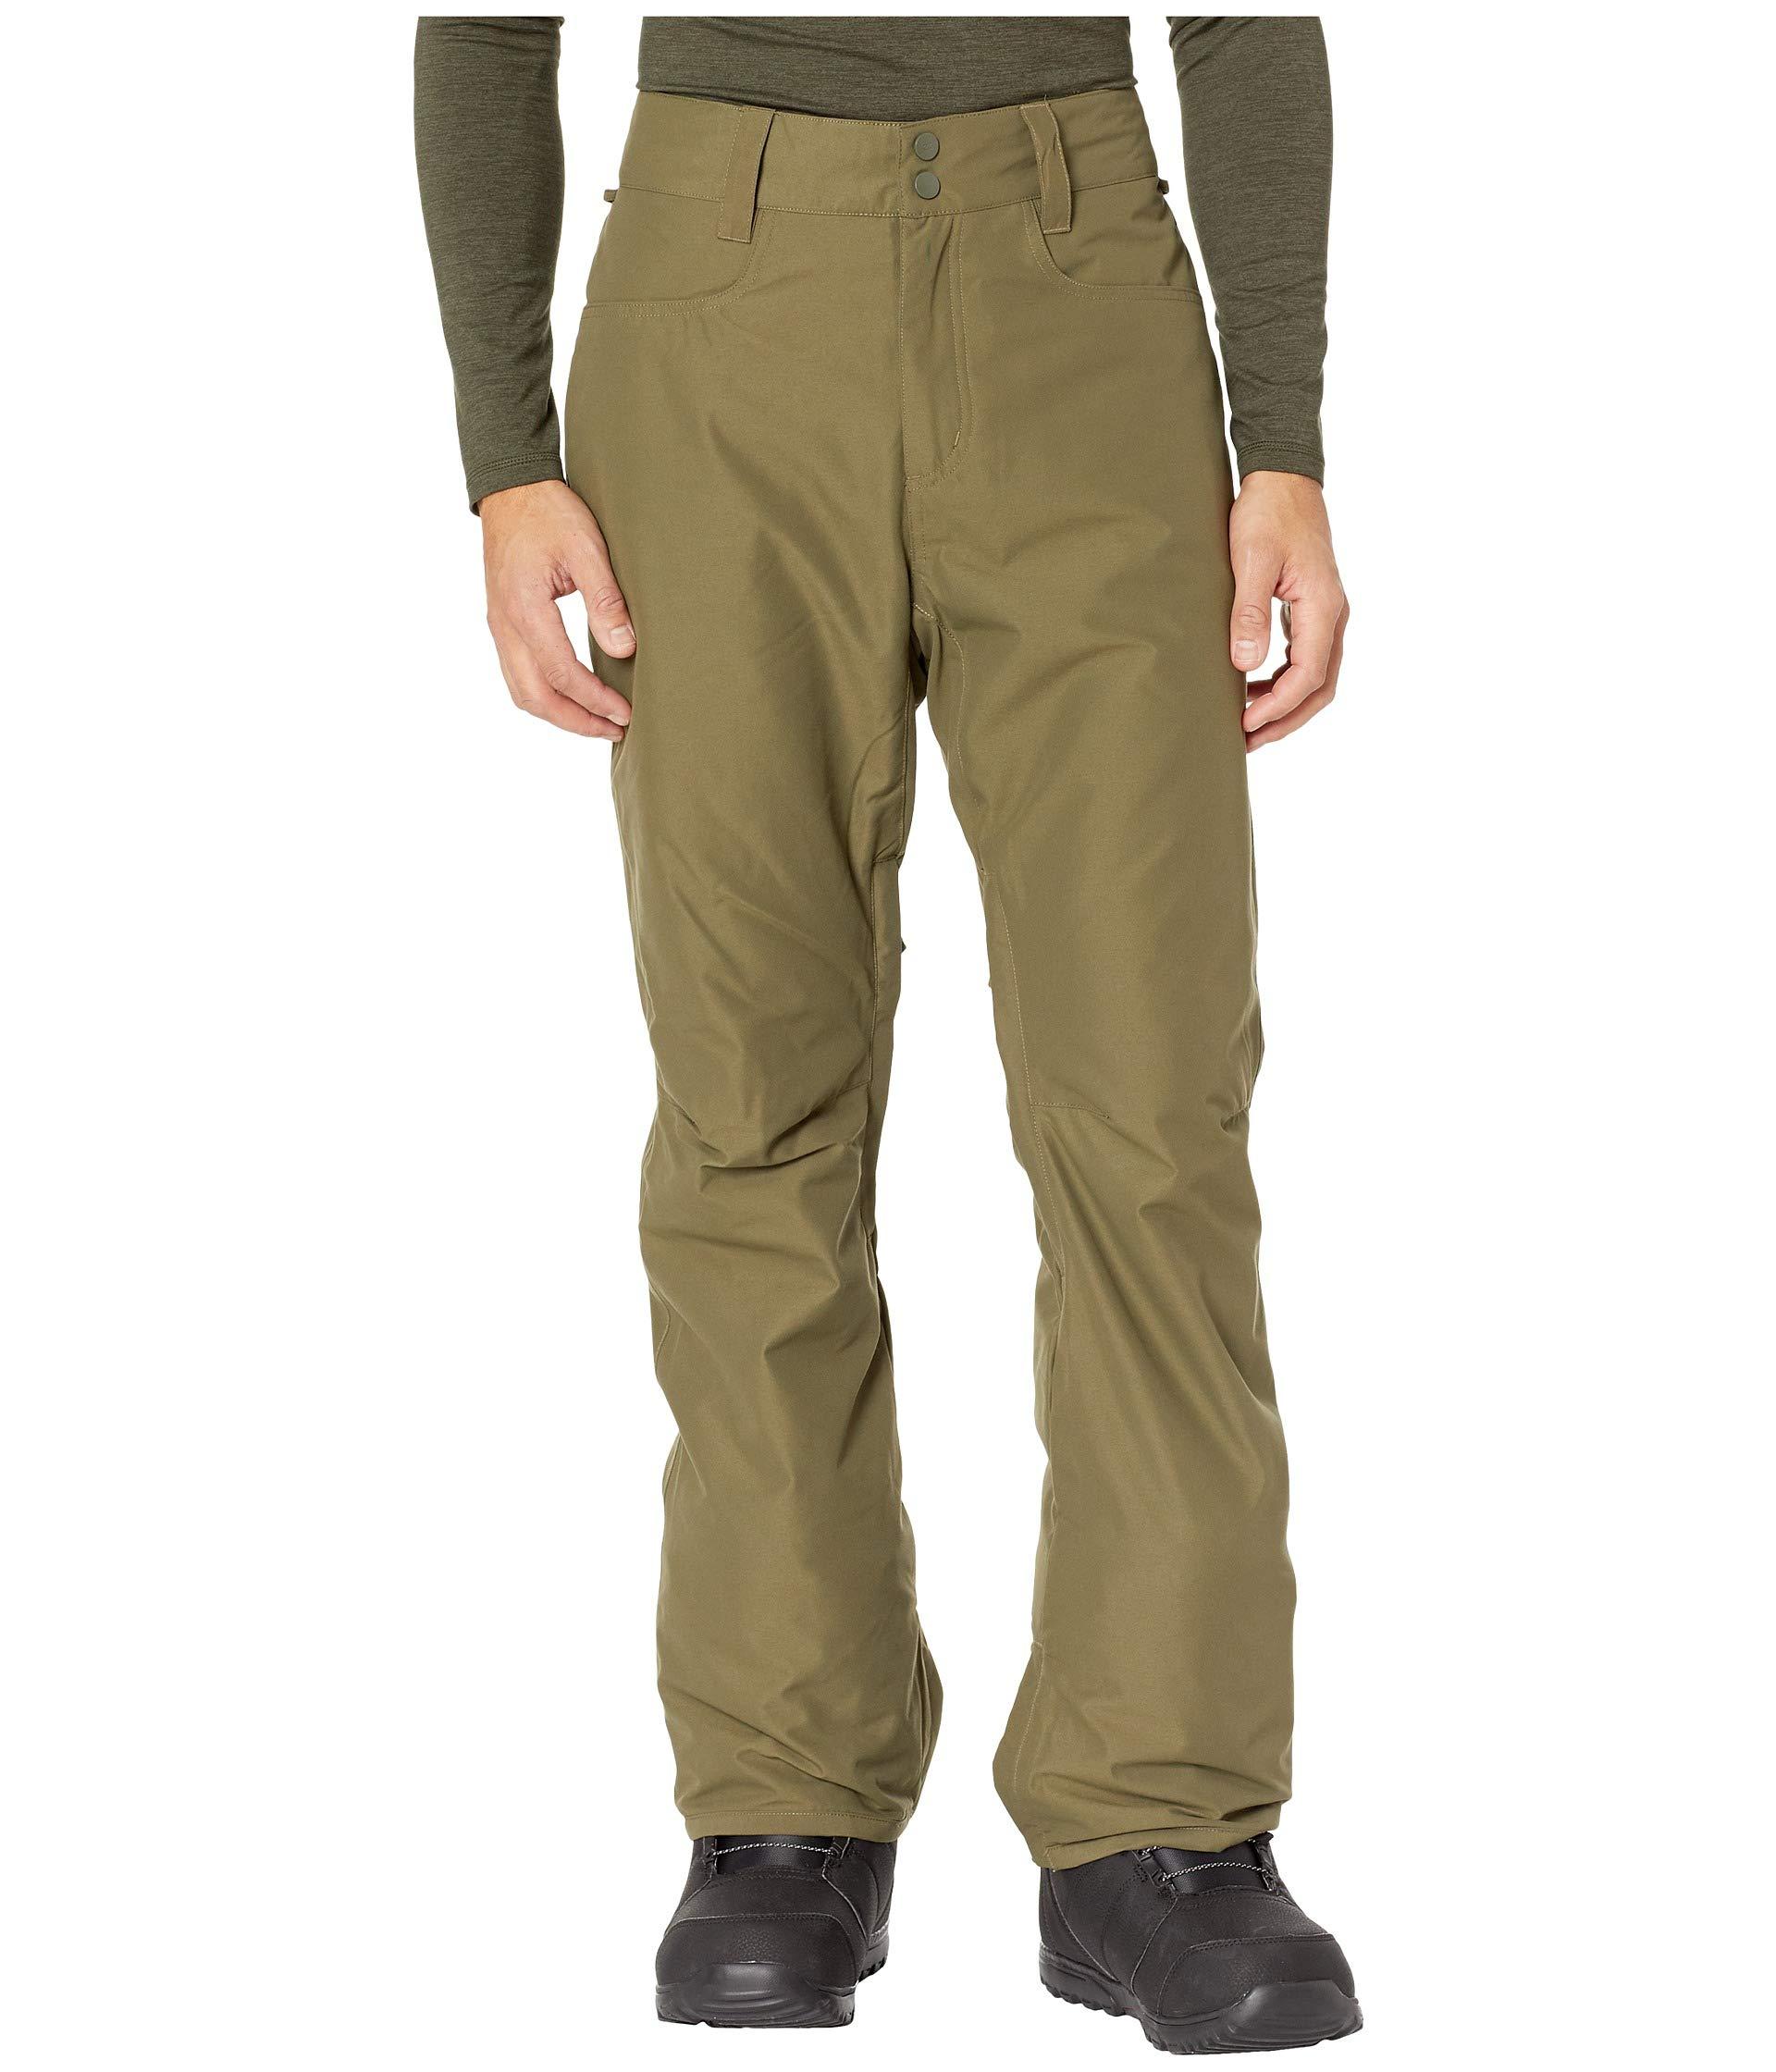 Insulated Grape Outsider Billabong Pants Leaf 5gq4SRw